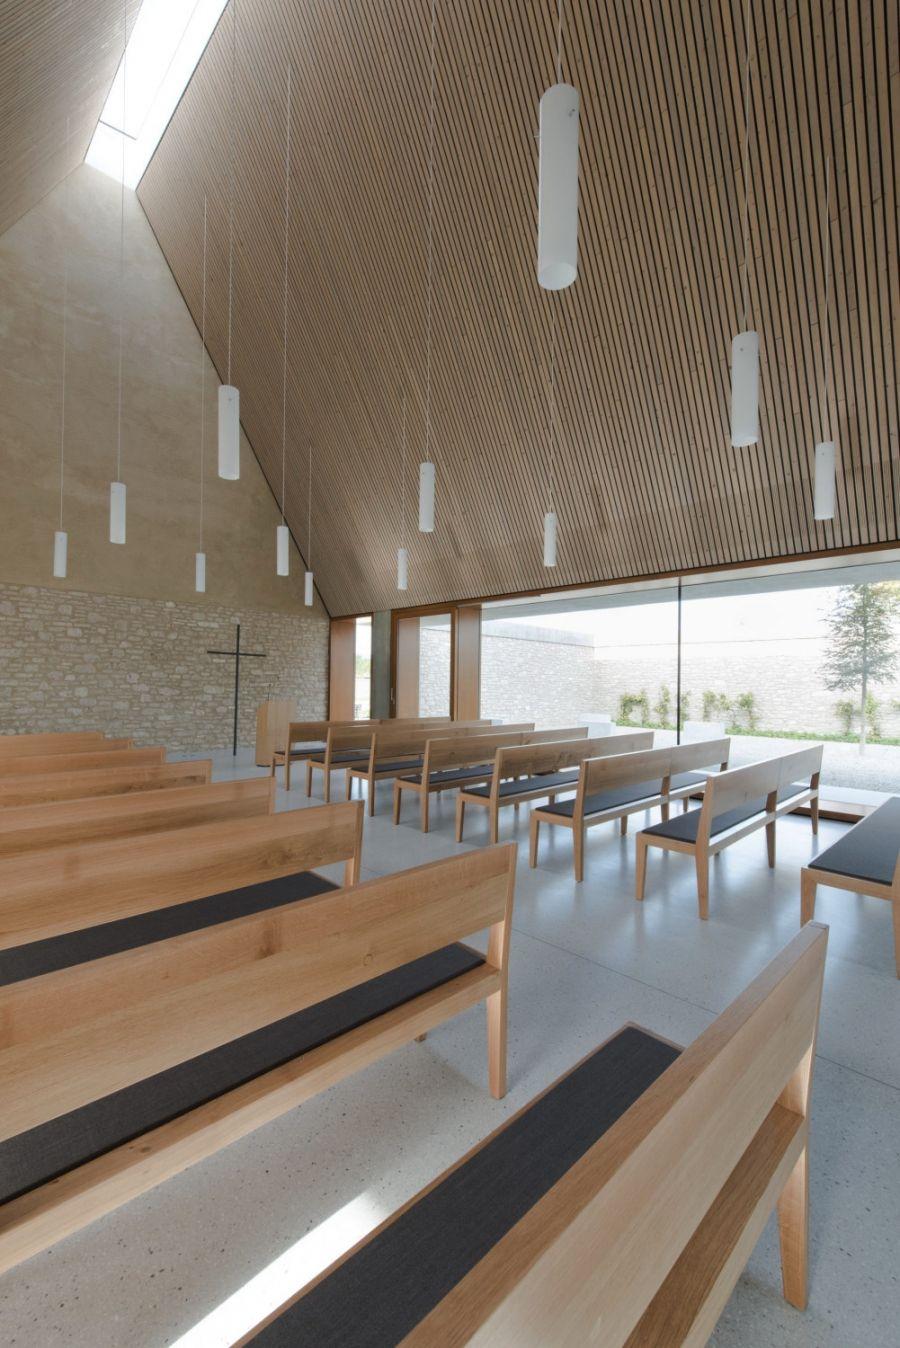 Gallery of ingelheim funeral chapel bayer strobel - Modern funeral home interior design ...